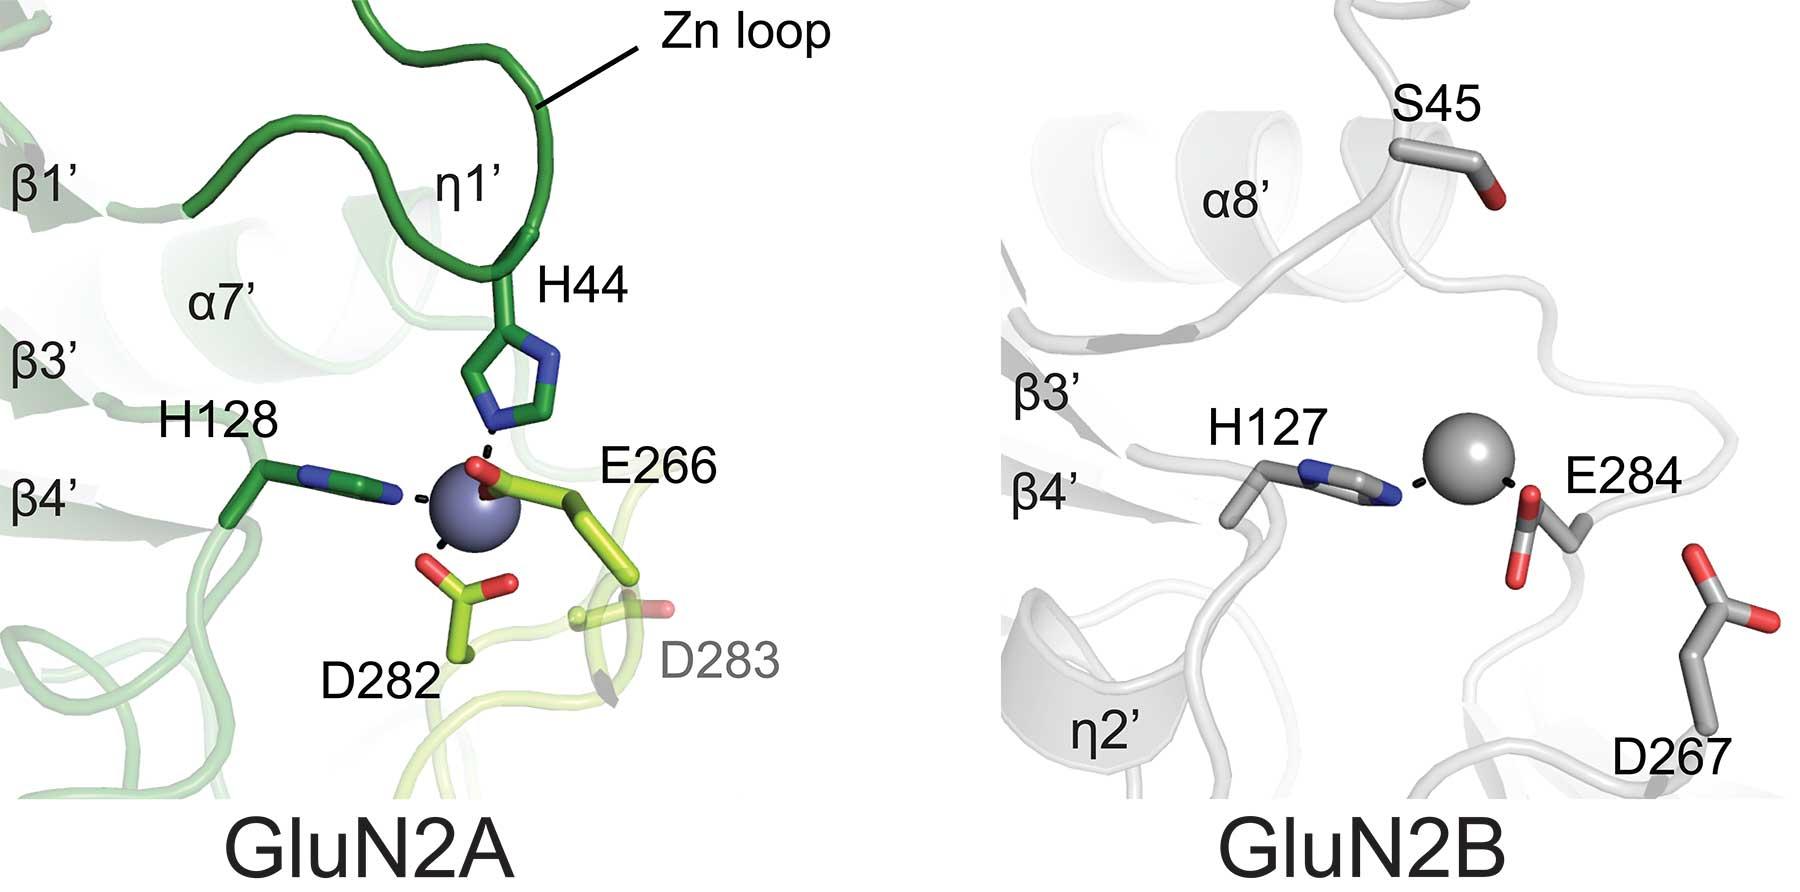 Zinc is an important inhibitory regulator of NMDA activity